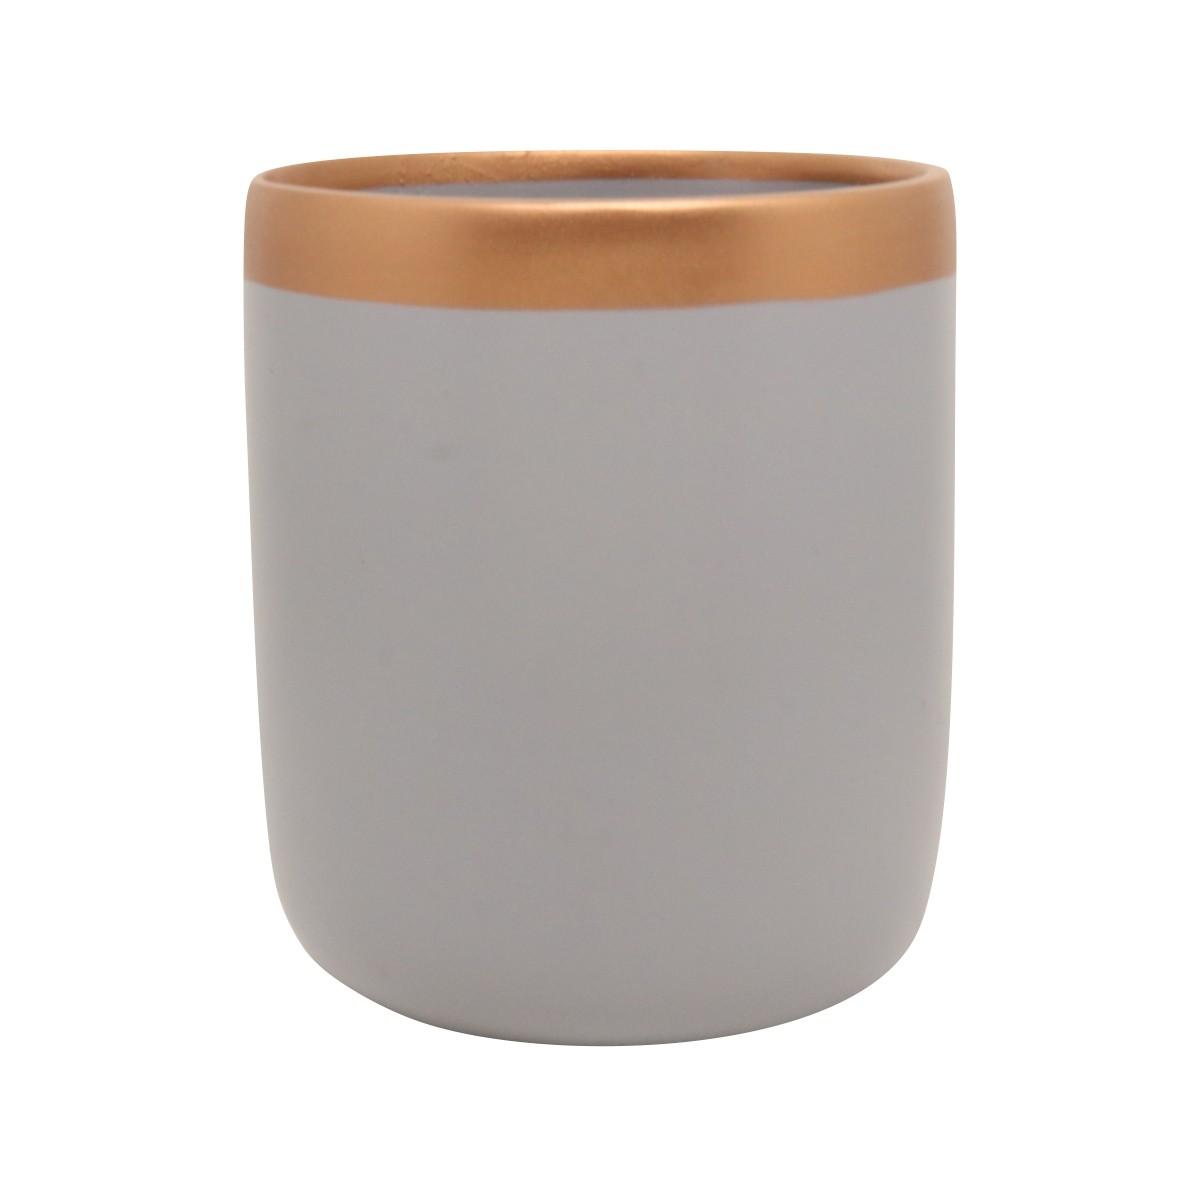 Vaso de Cerâmica para Suculentas Novel Grande Cinza e Bronze 14cm x 12cm - 5762